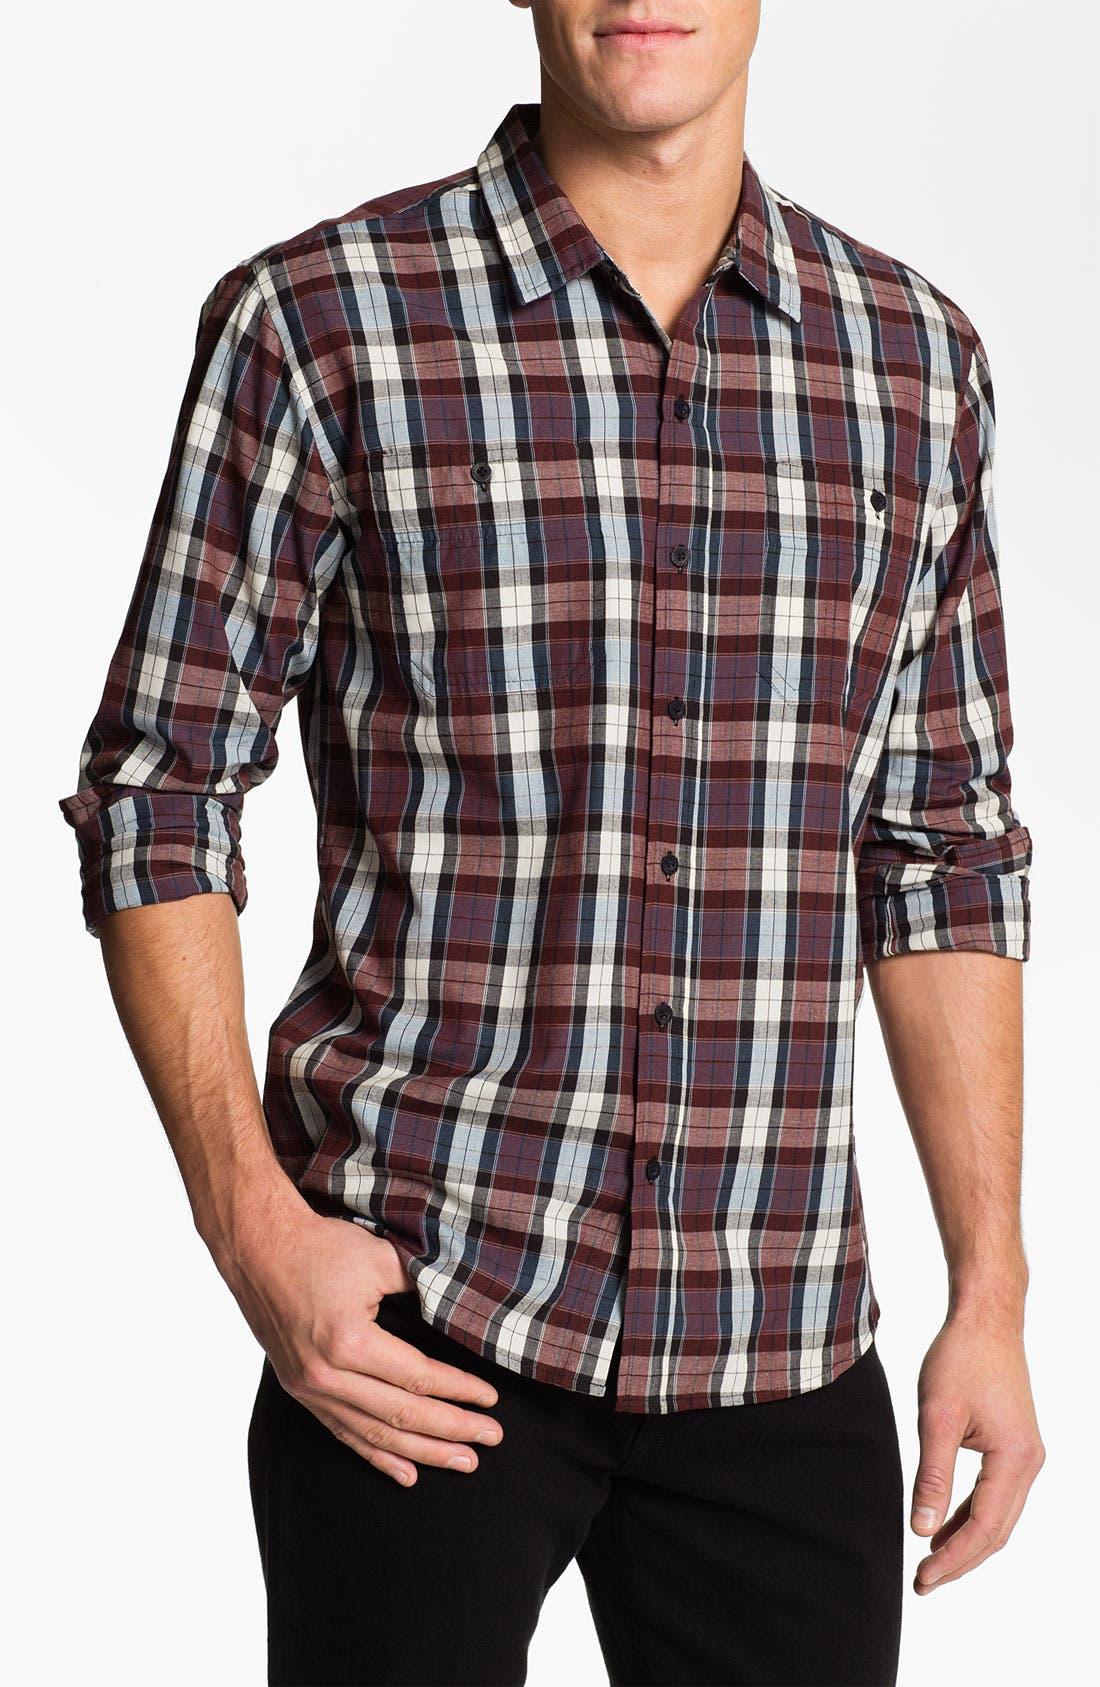 Alternate Image 1 Selected - Ezekiel 'Canyon' Plaid Woven Shirt